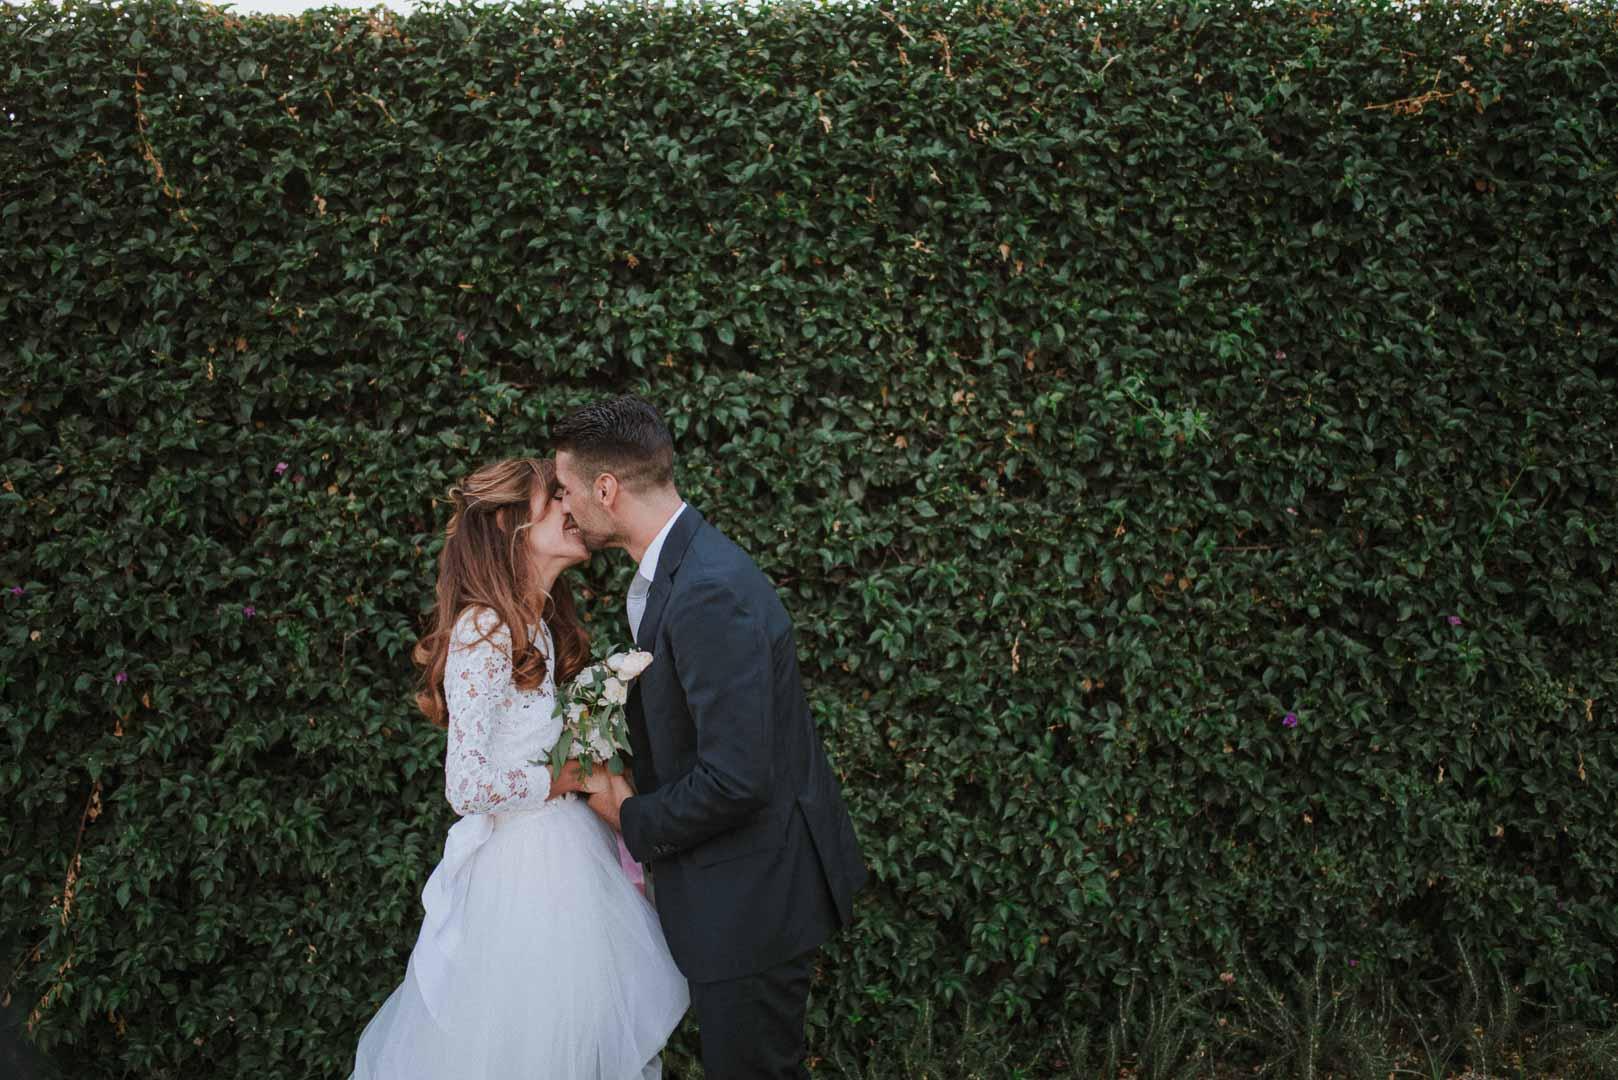 wedding-photographer-destination-fineart-bespoke-reportage-napoli-nabilah-vivianeizzo-spazio46-102